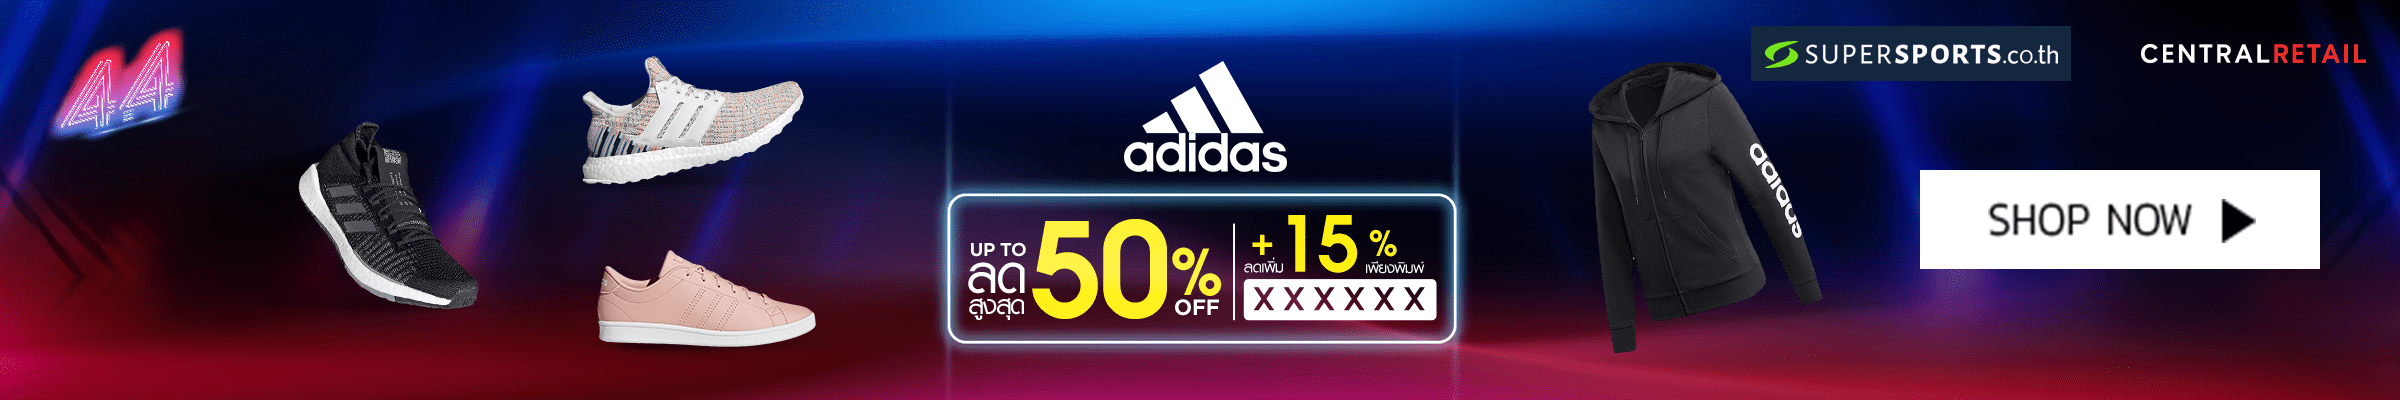 Super Sports - 4.4 Sale Adidas